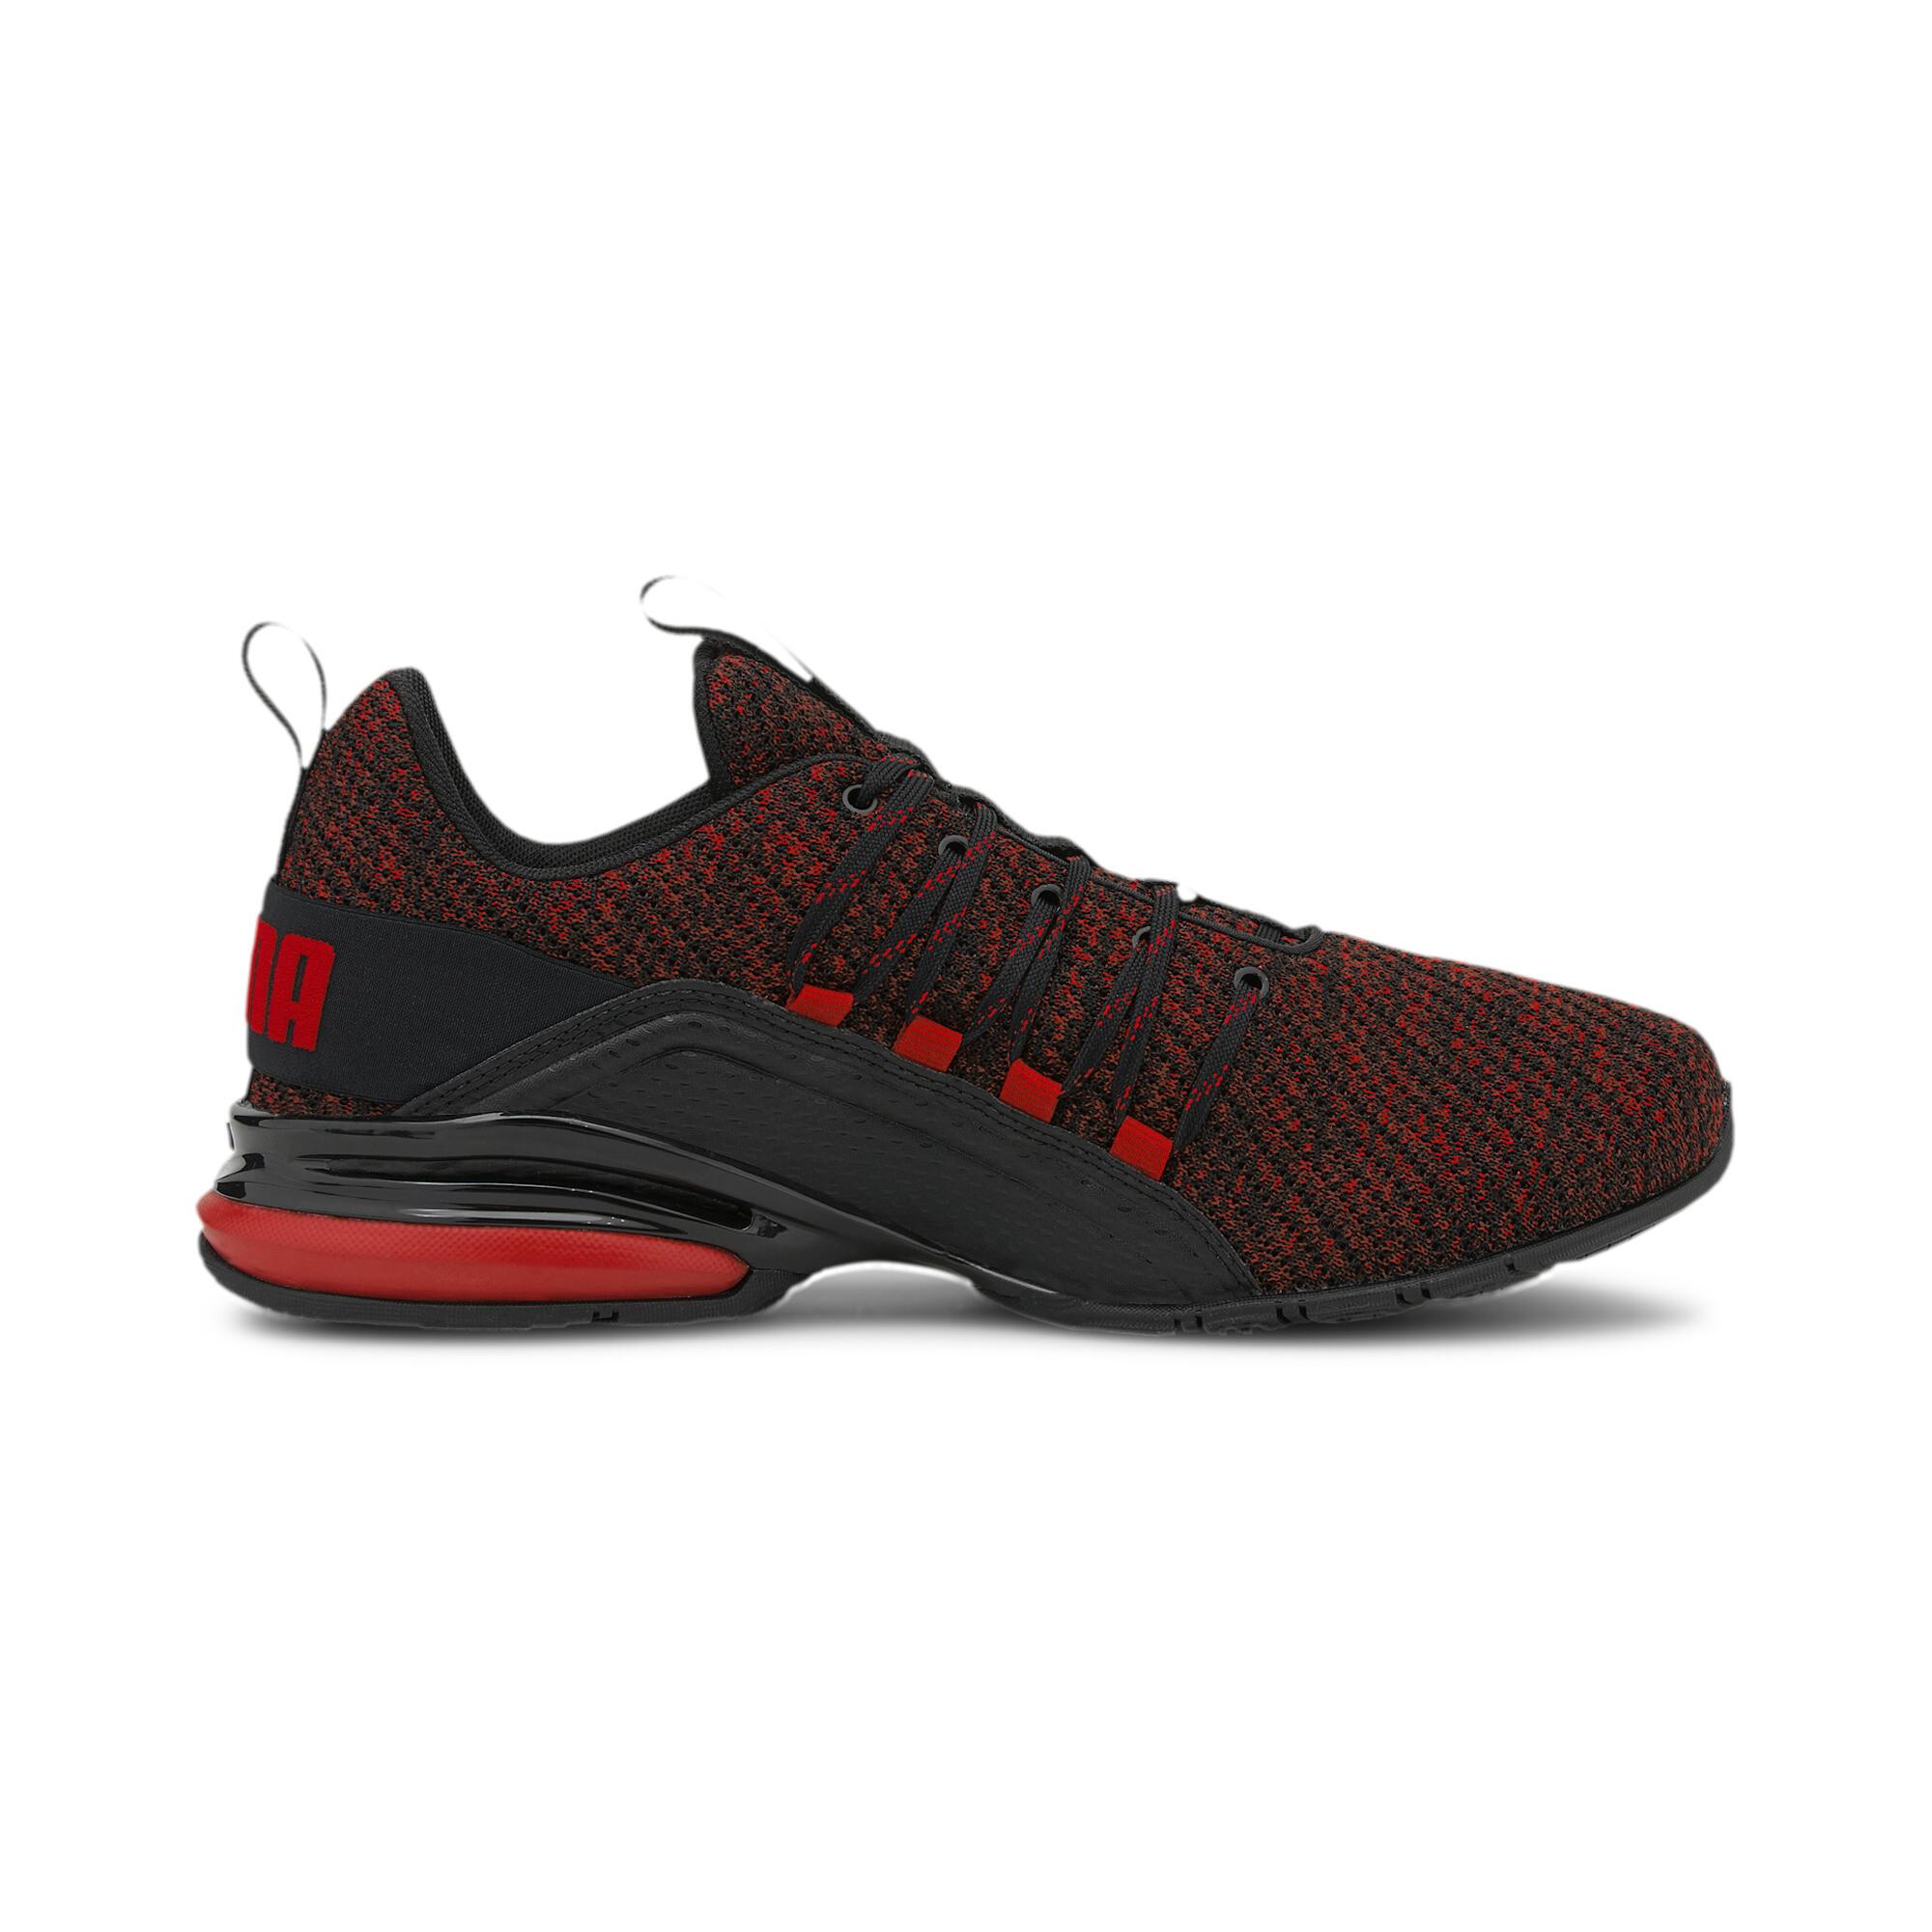 PUMA-Men-039-s-Axelion-Ultra-Running-Shoes thumbnail 7